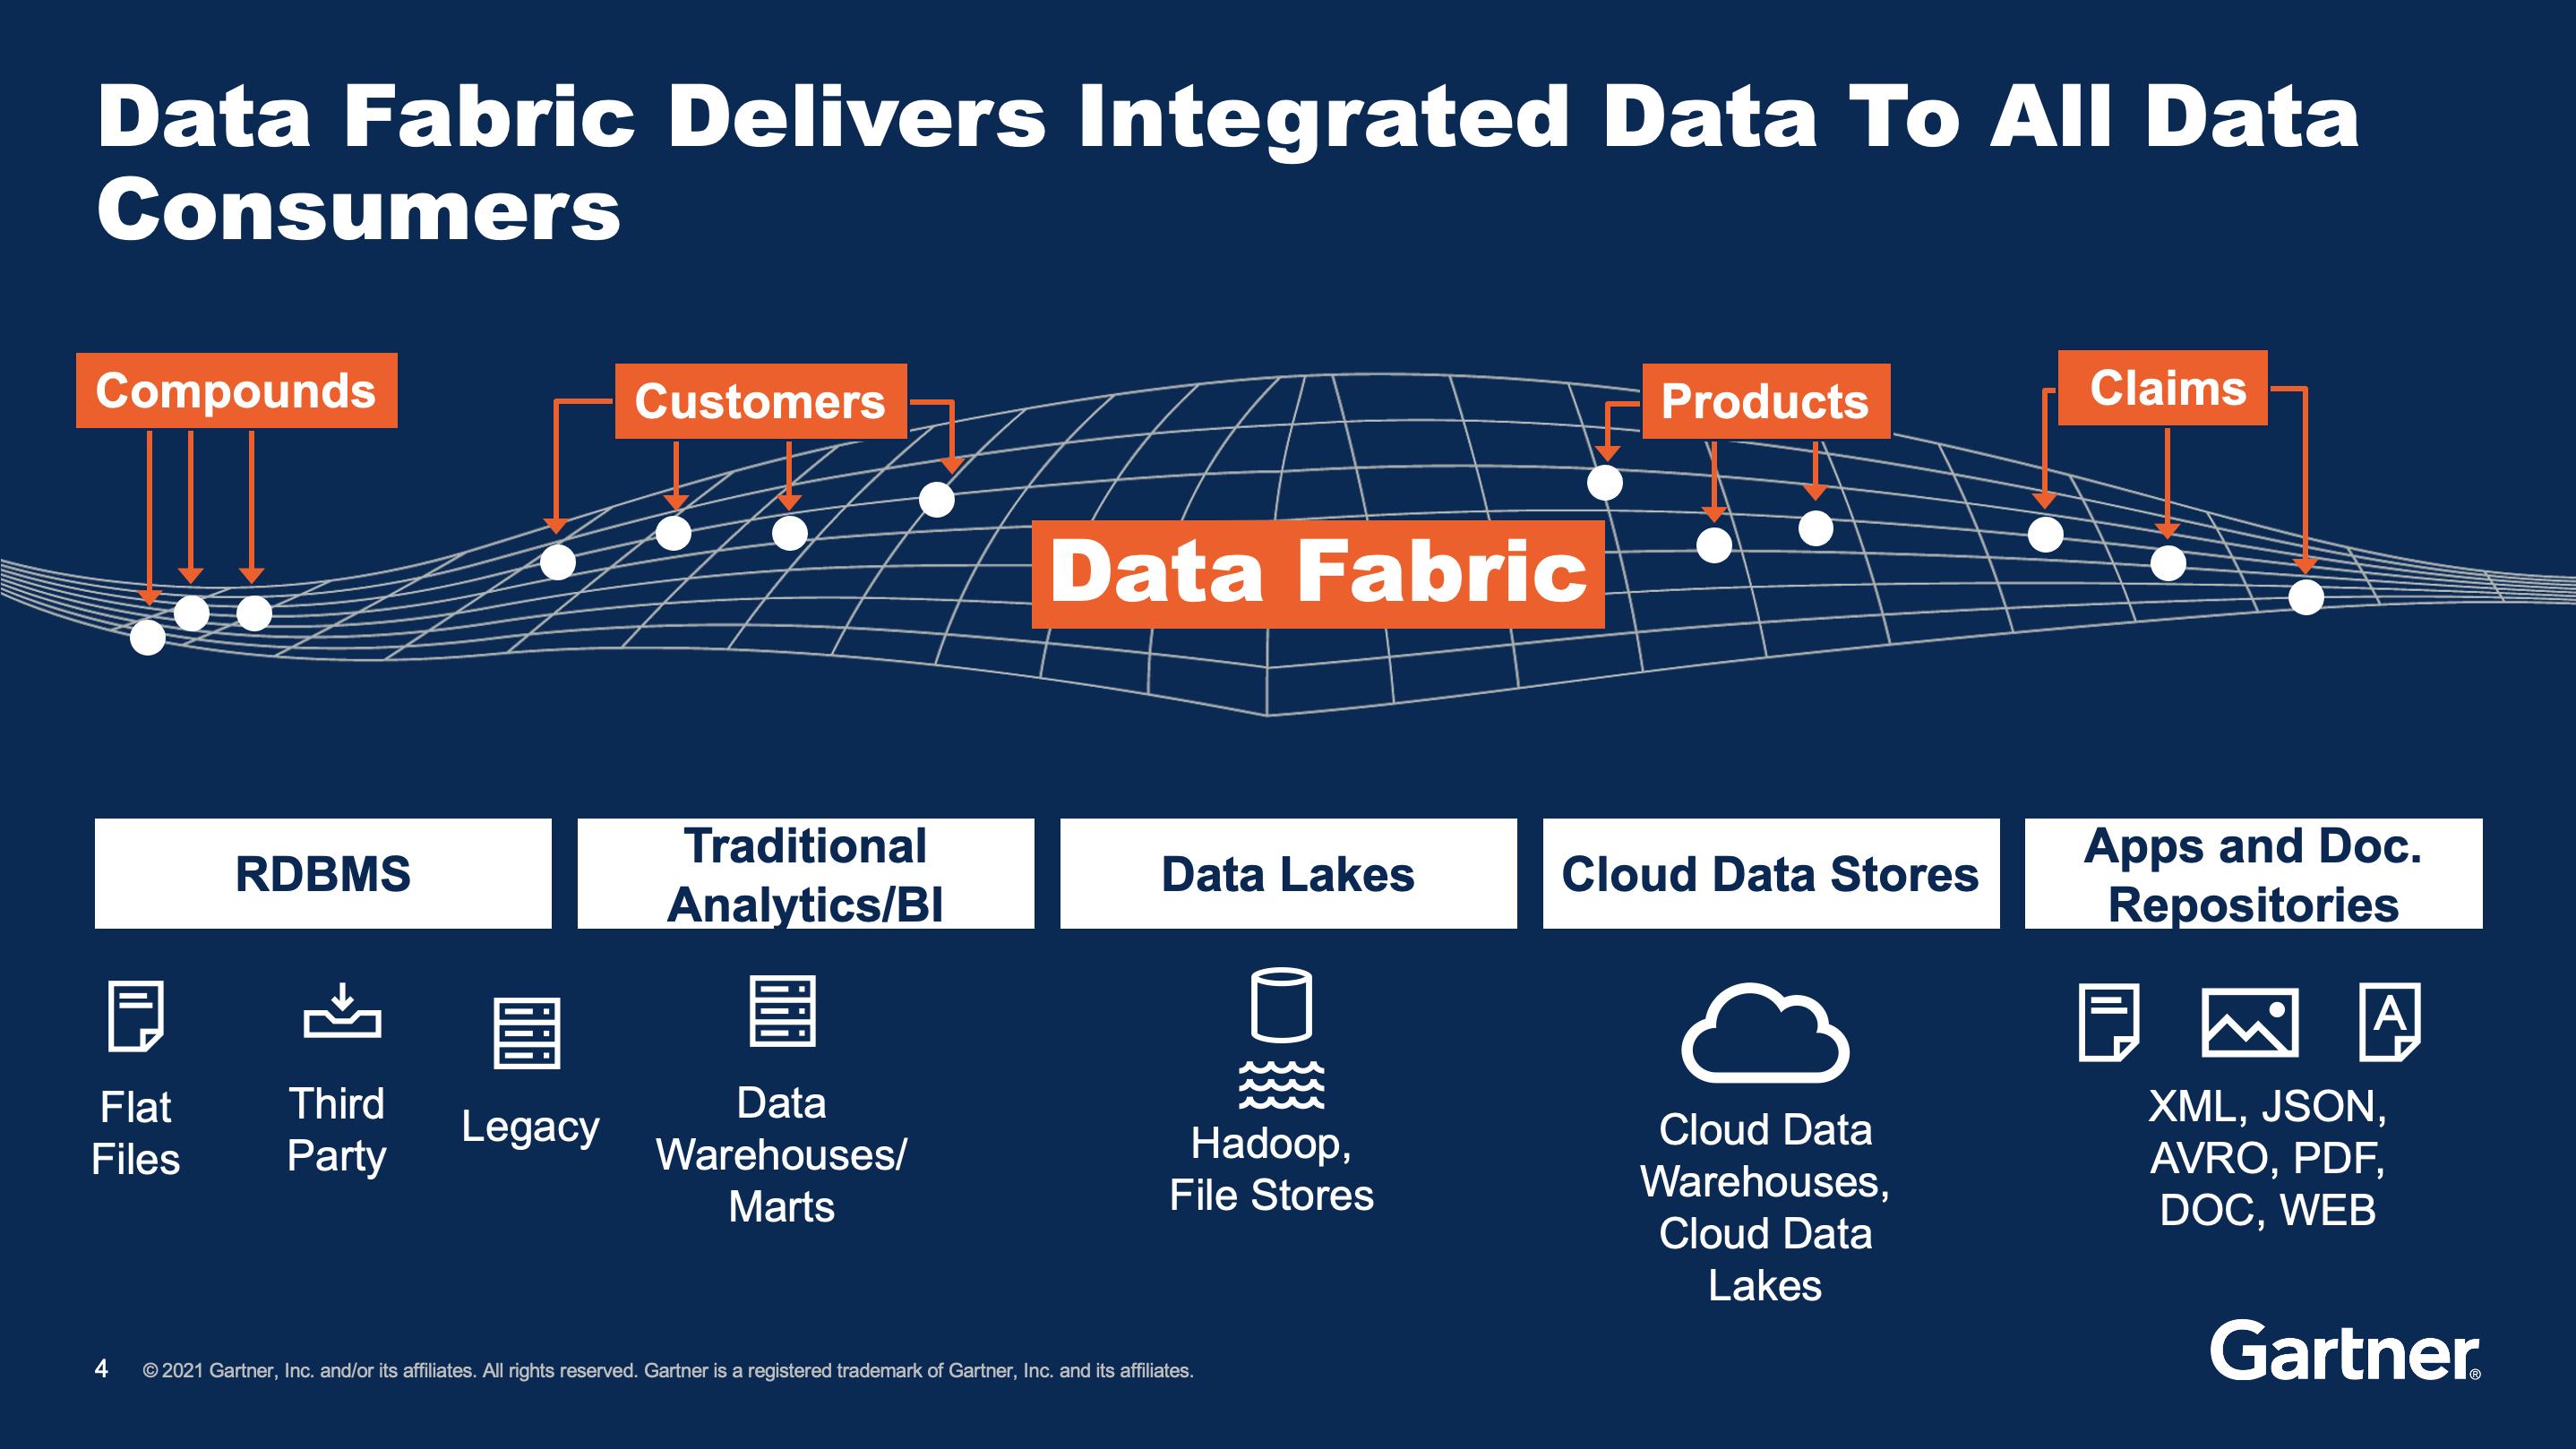 Data fabric diagram from Gartner